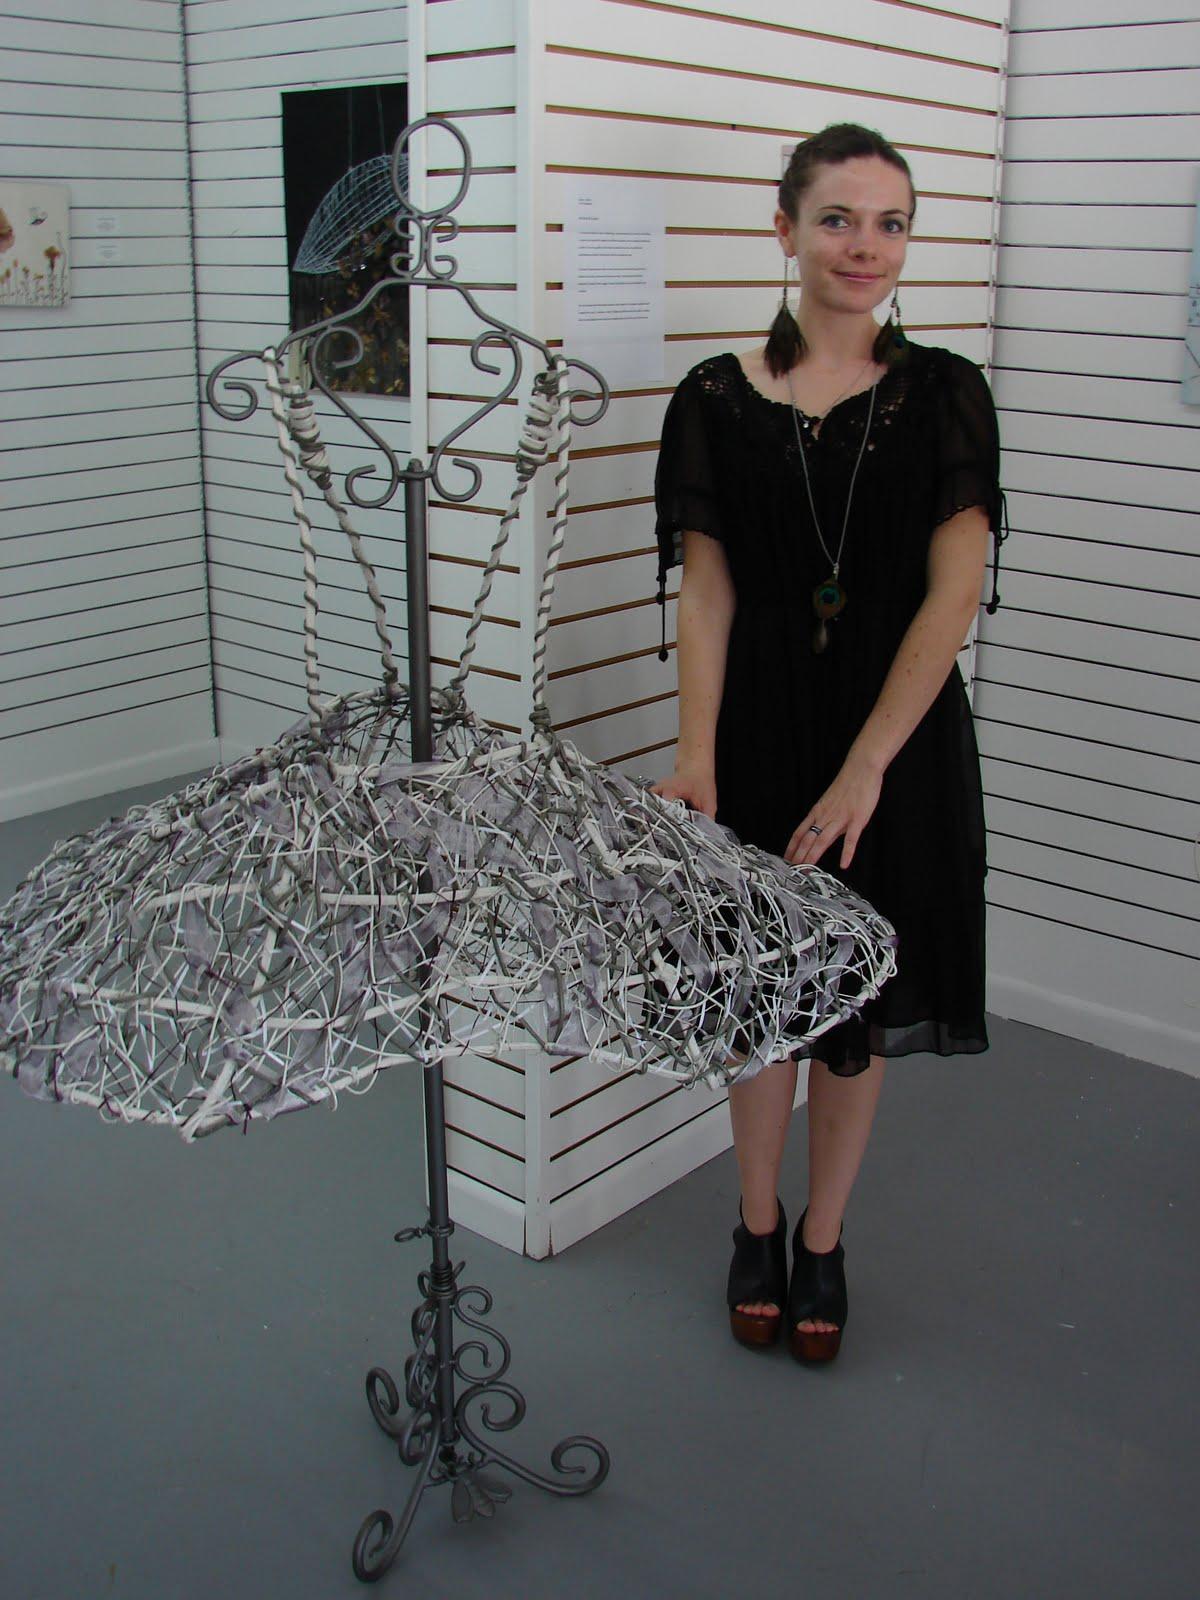 Palm Beach ArtsPaper: June 2011